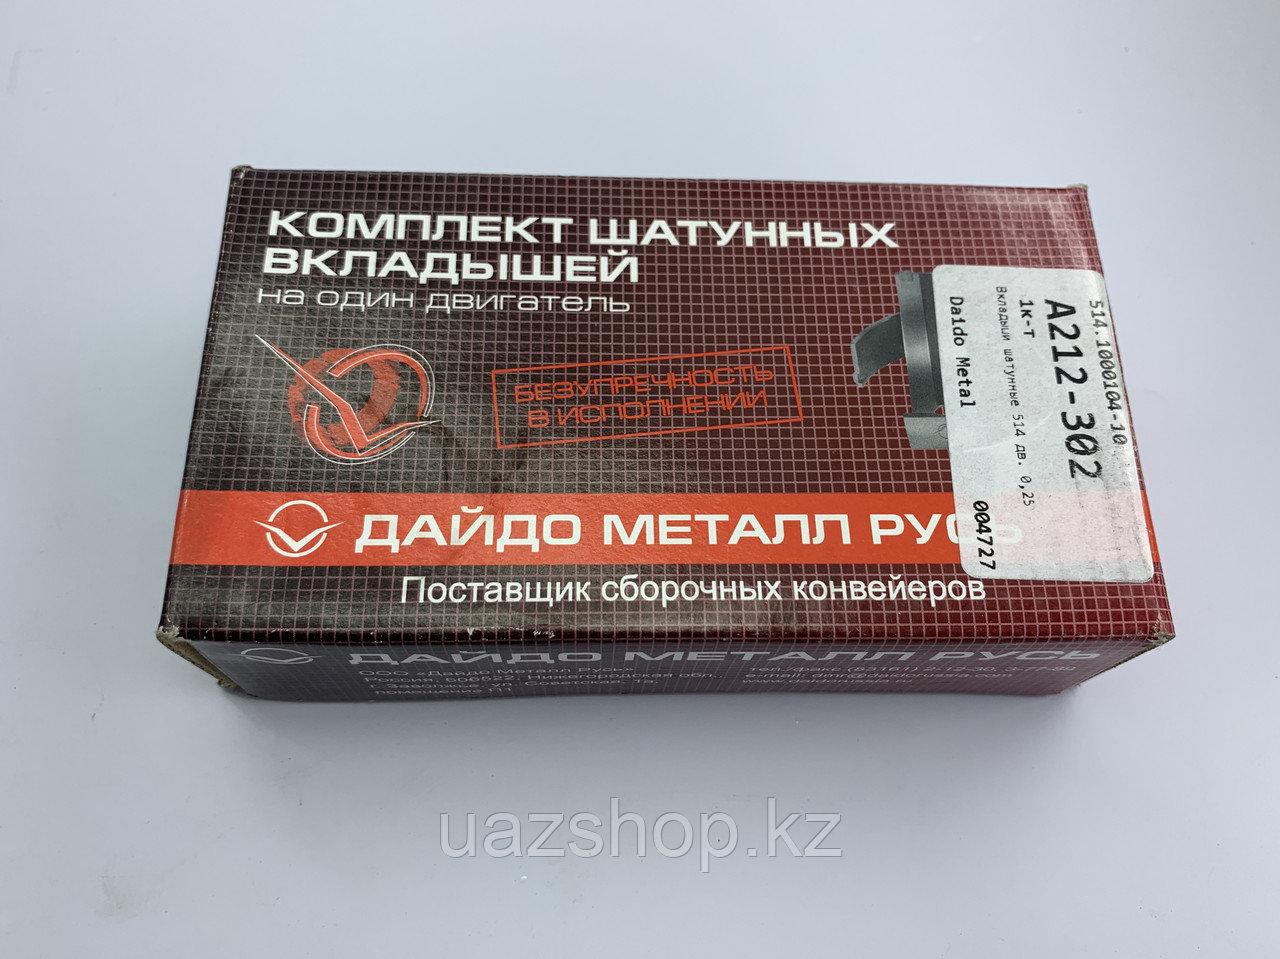 Комплект шатунных вкладышей для ЗМЗ 514  (0,25)